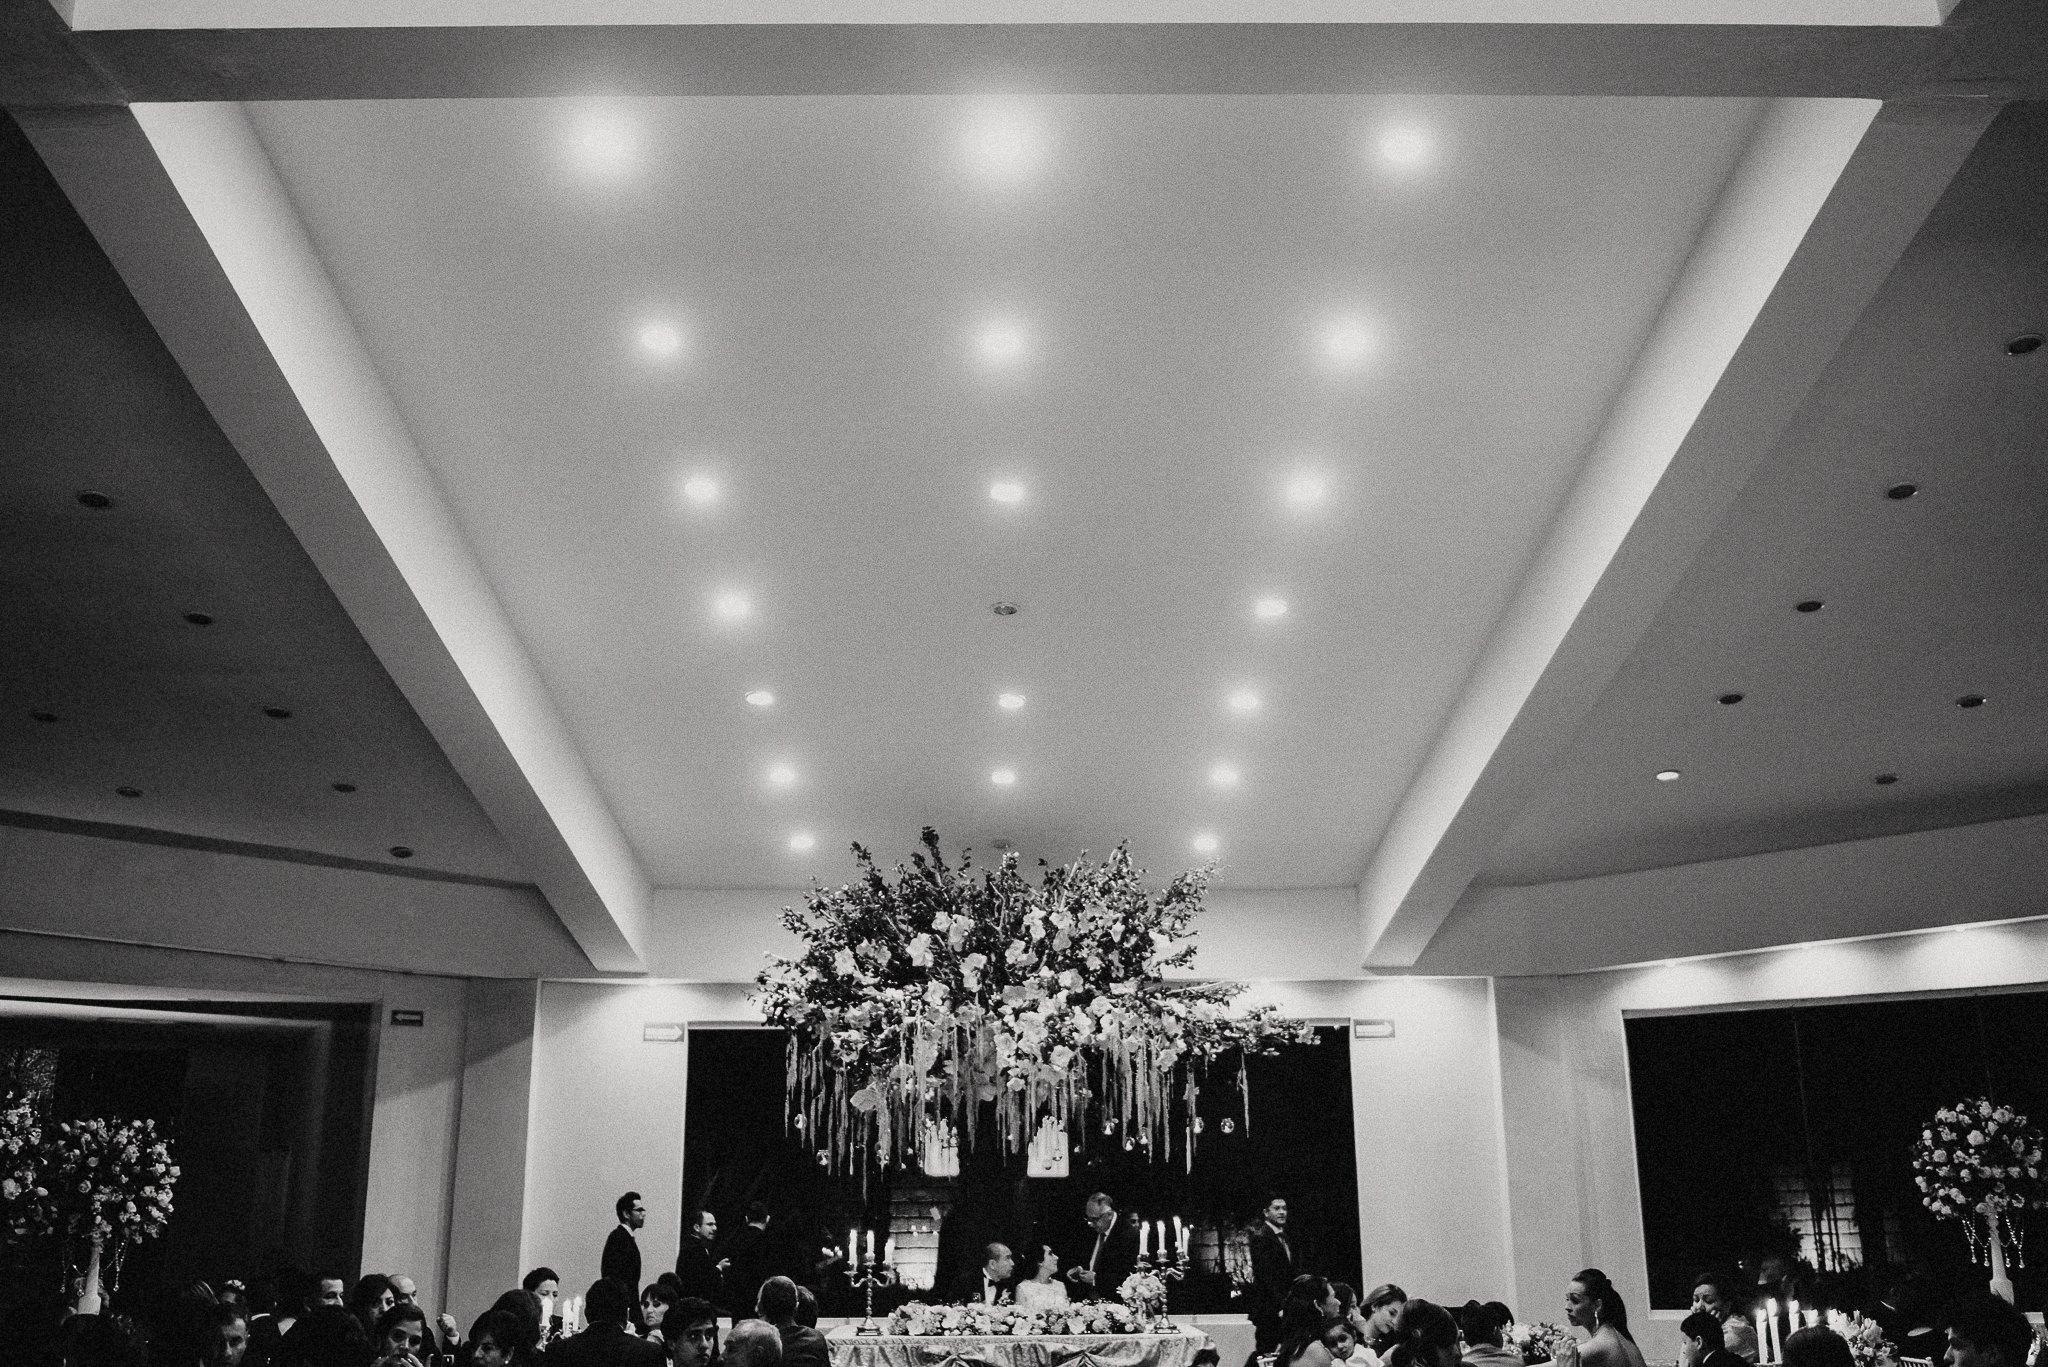 Wedding-Boda-Tulancingo-Hidalgo-Salon-Essenzia-Luis-Houdin-46-film